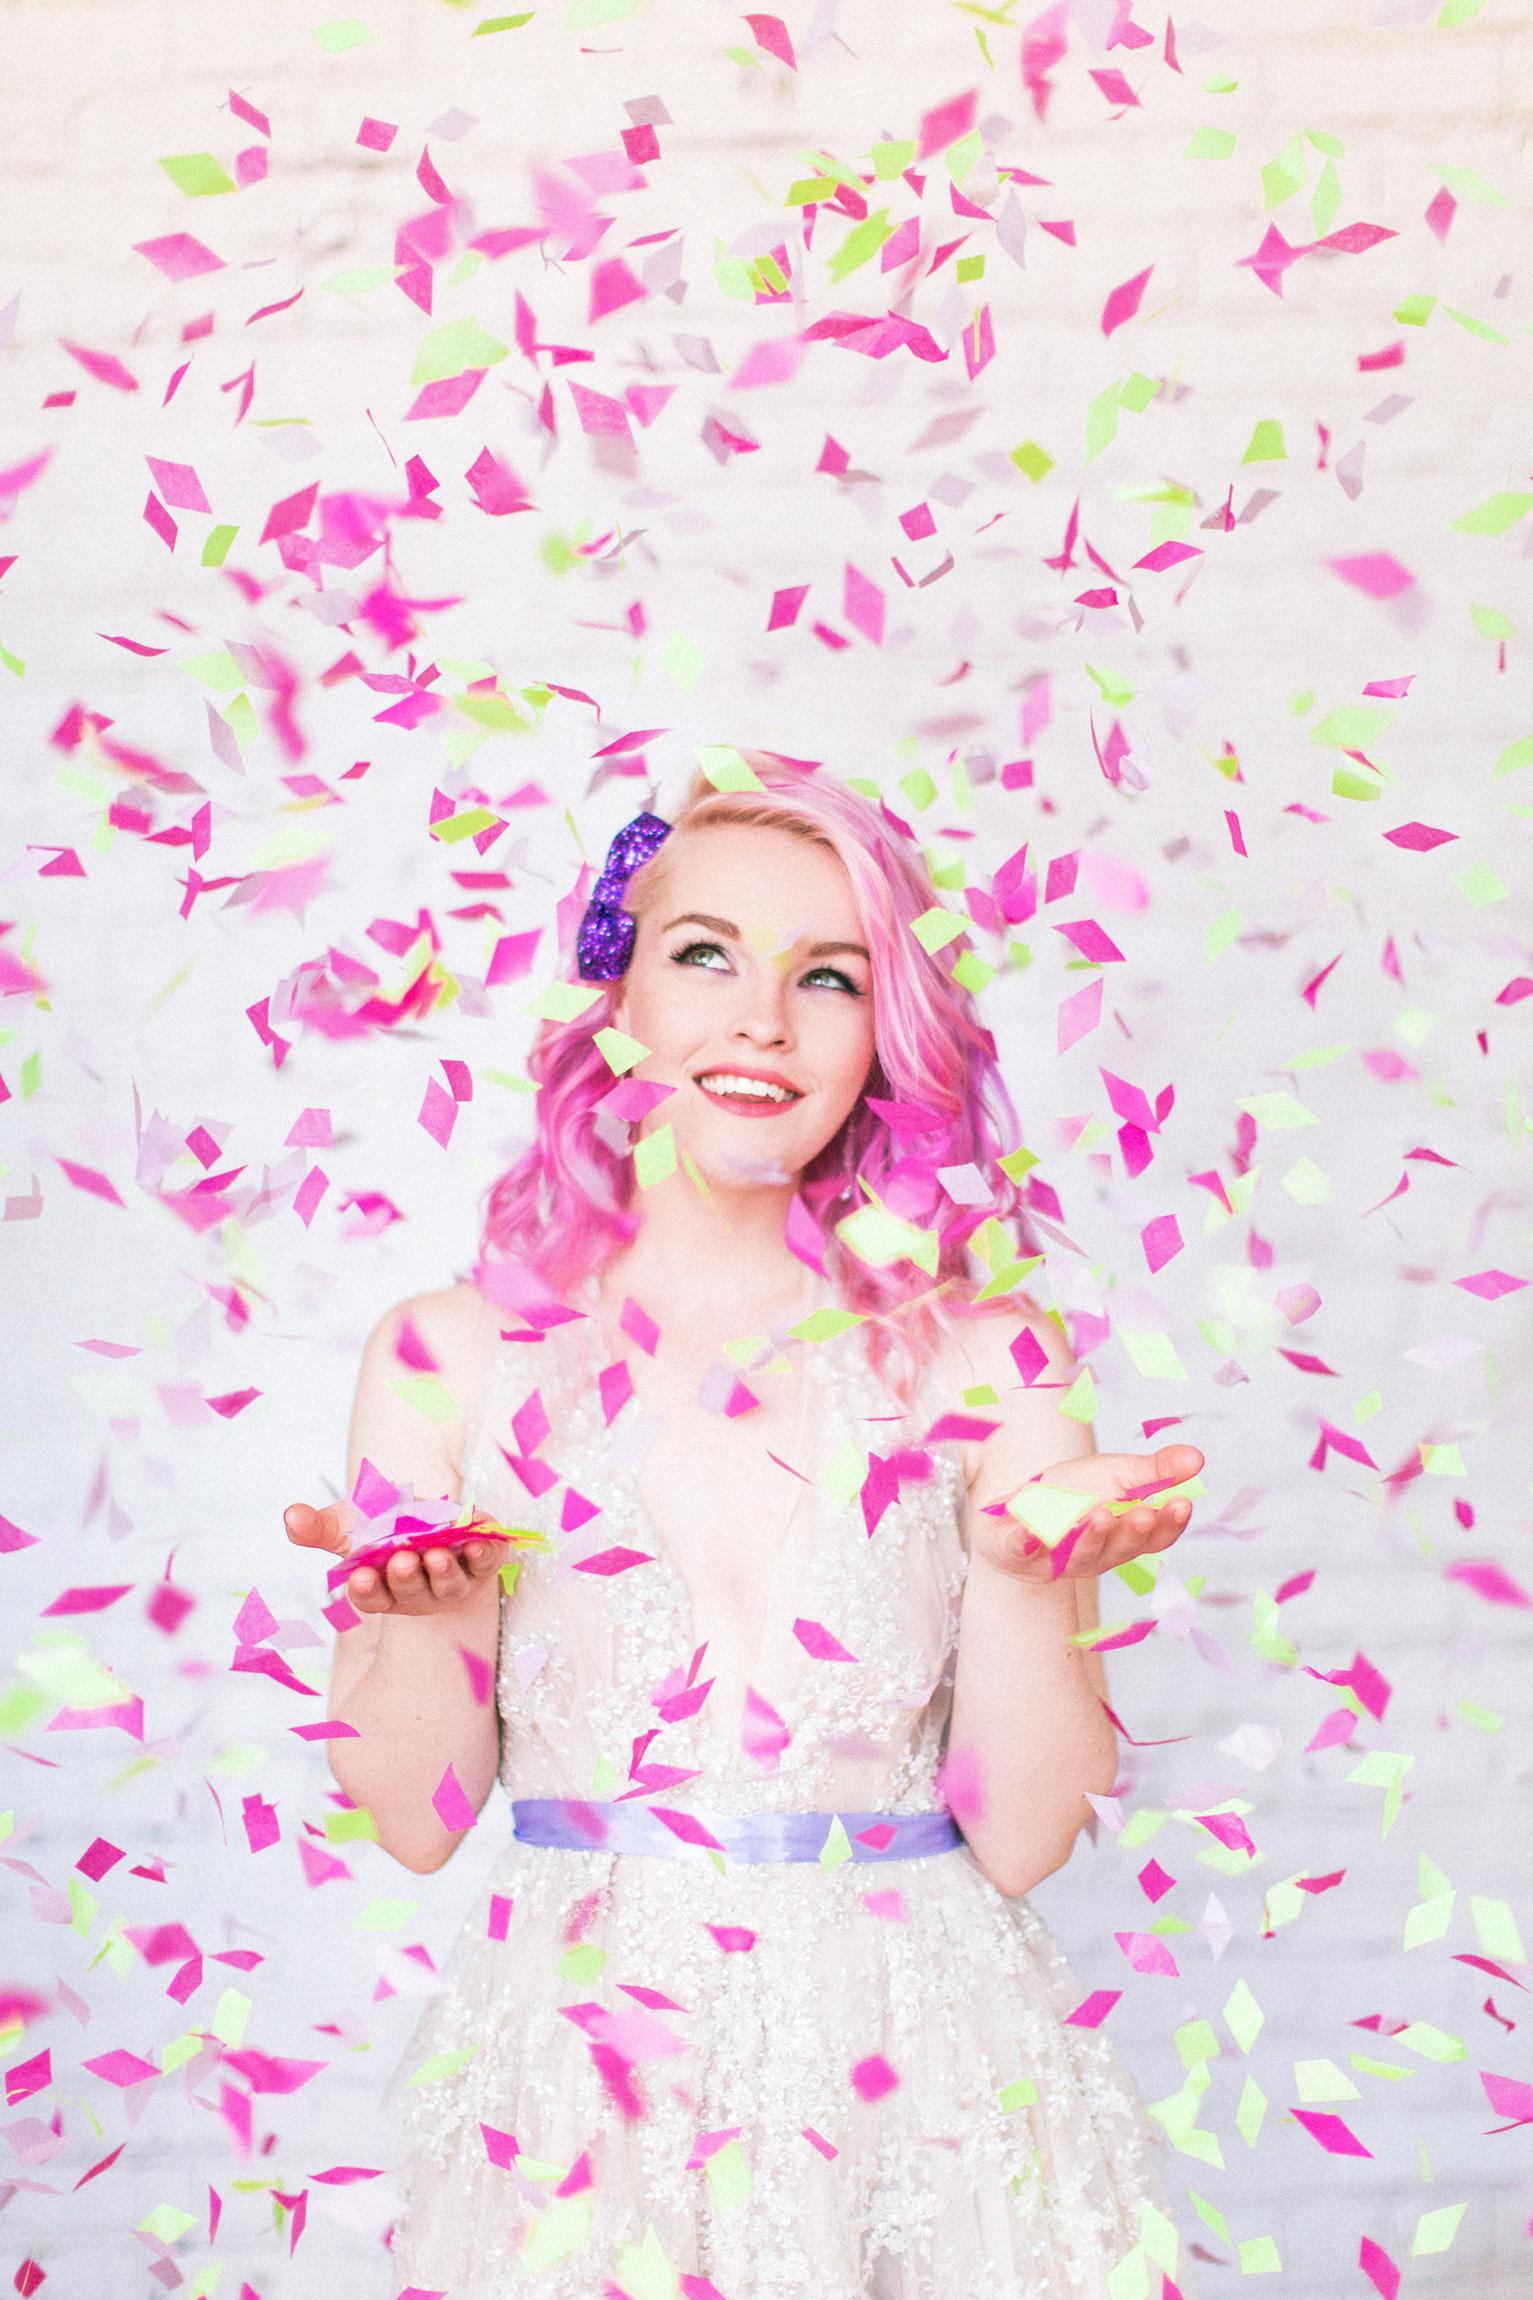 Confetti Bride Inspiration by Miss Munro and Sanshine Photography (32).jpg